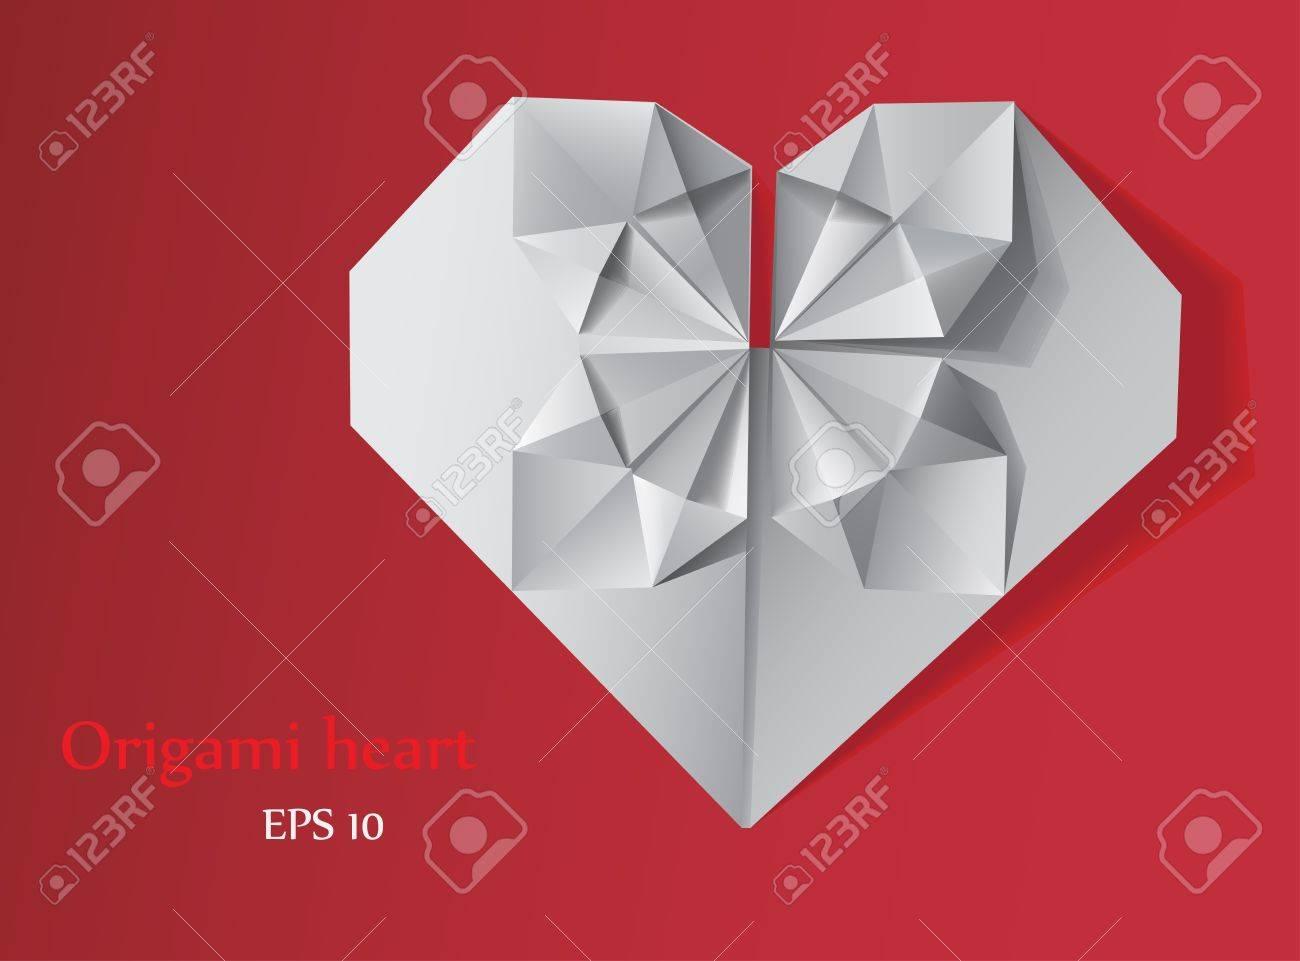 Origami heart Stock Vector - 15197306